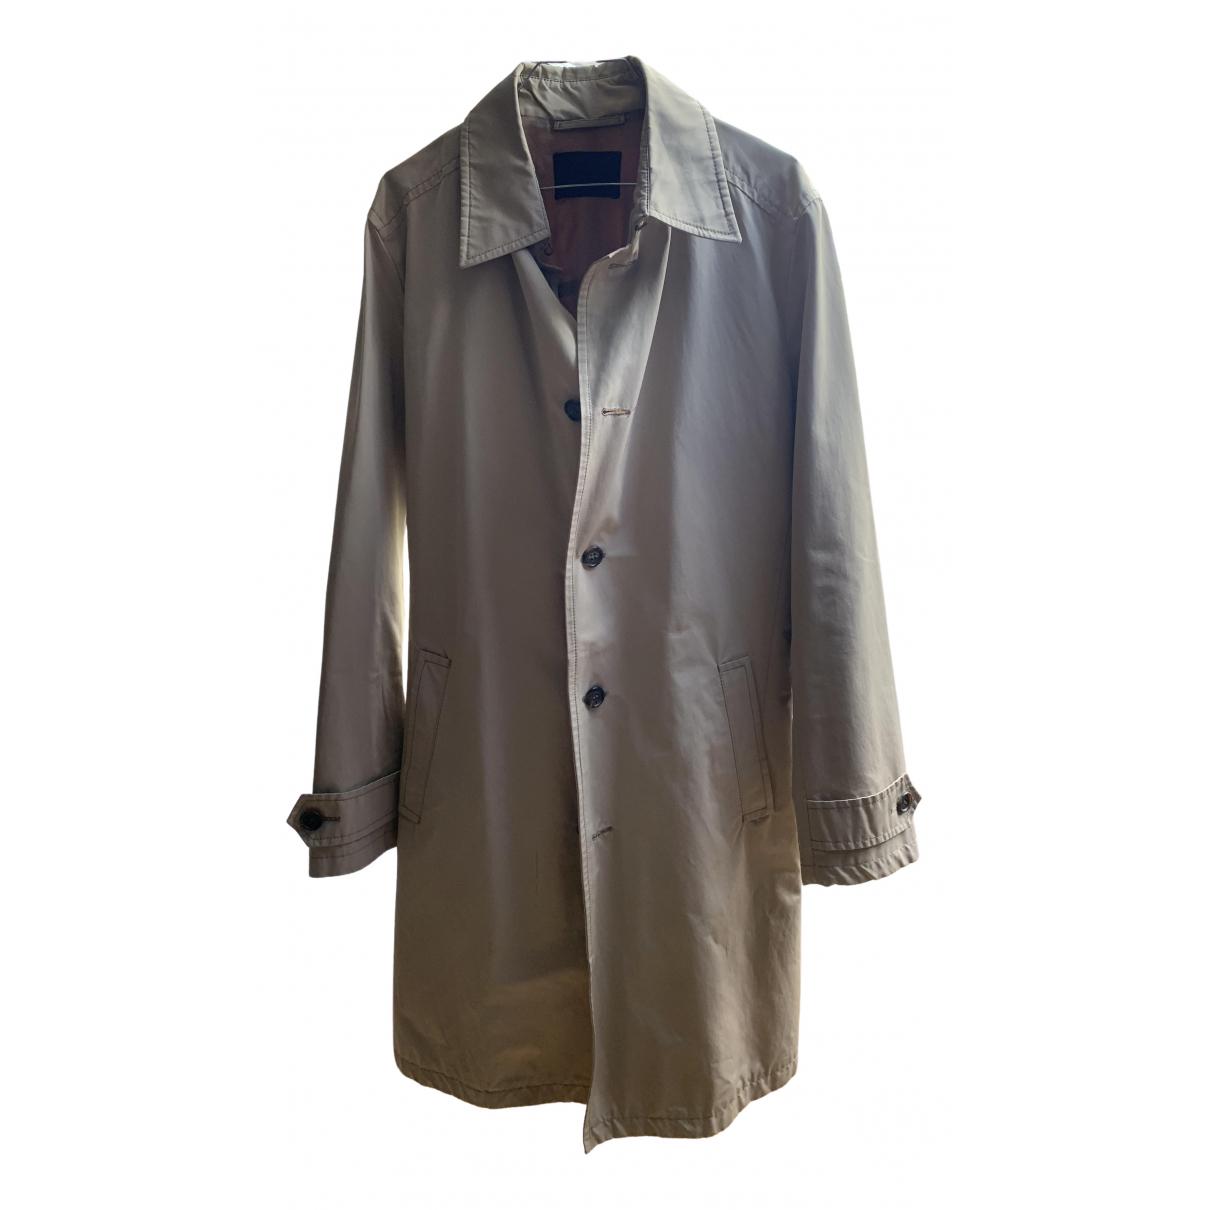 Prada \N Beige coat  for Men 50 IT